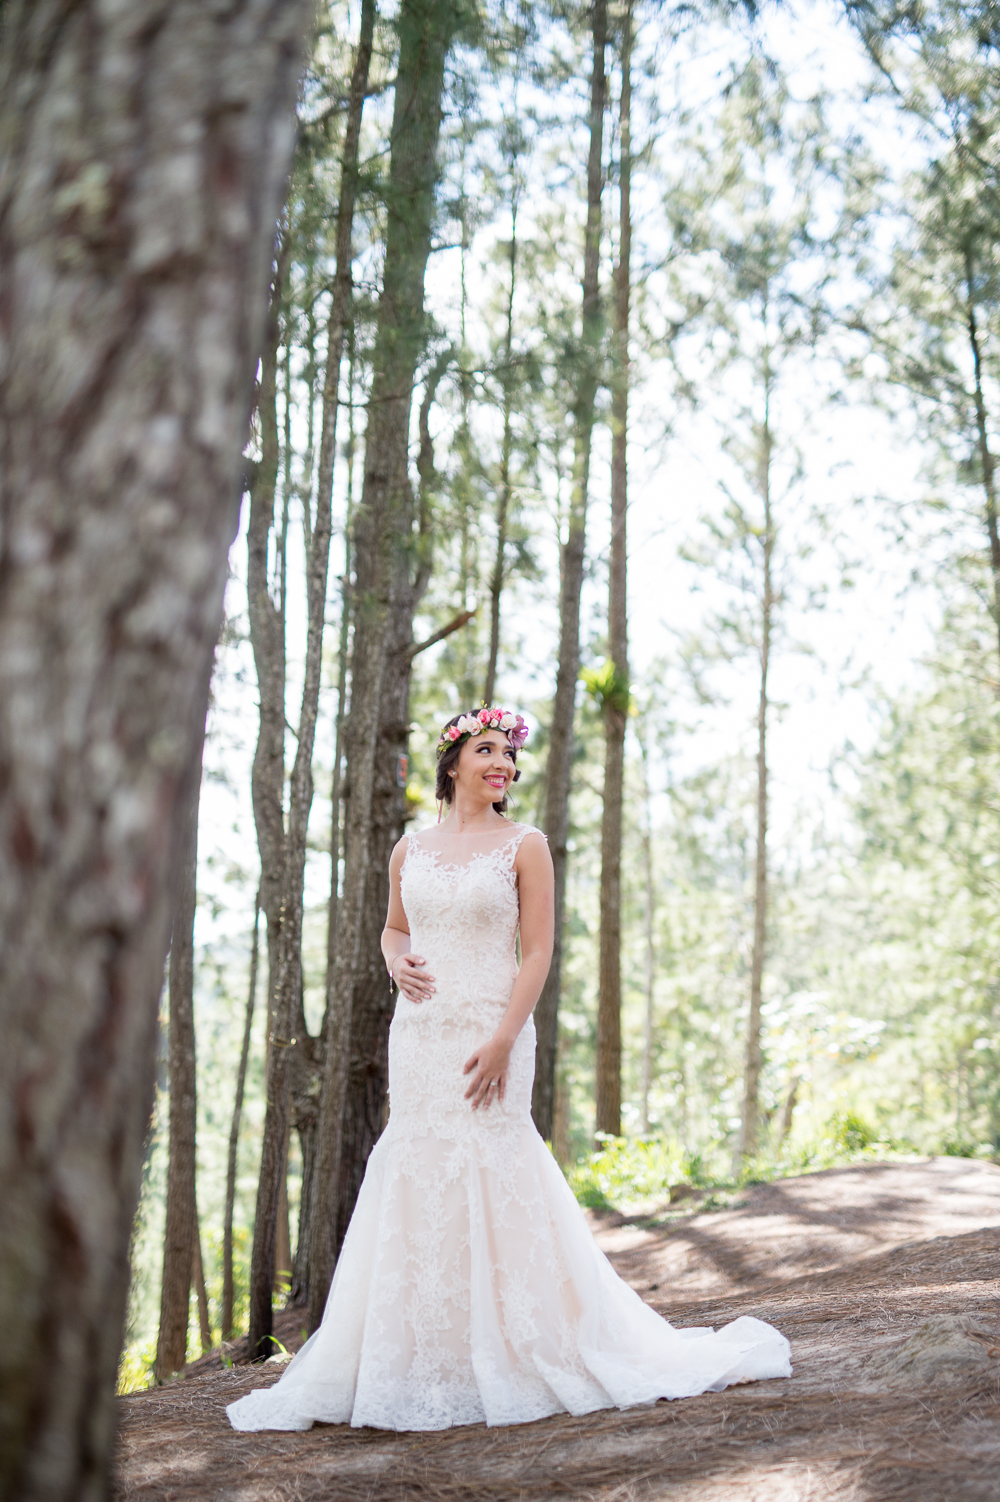 fotografia-bodas-puerto-rico-bosque-pinos-cayey-salinas-5.jpg